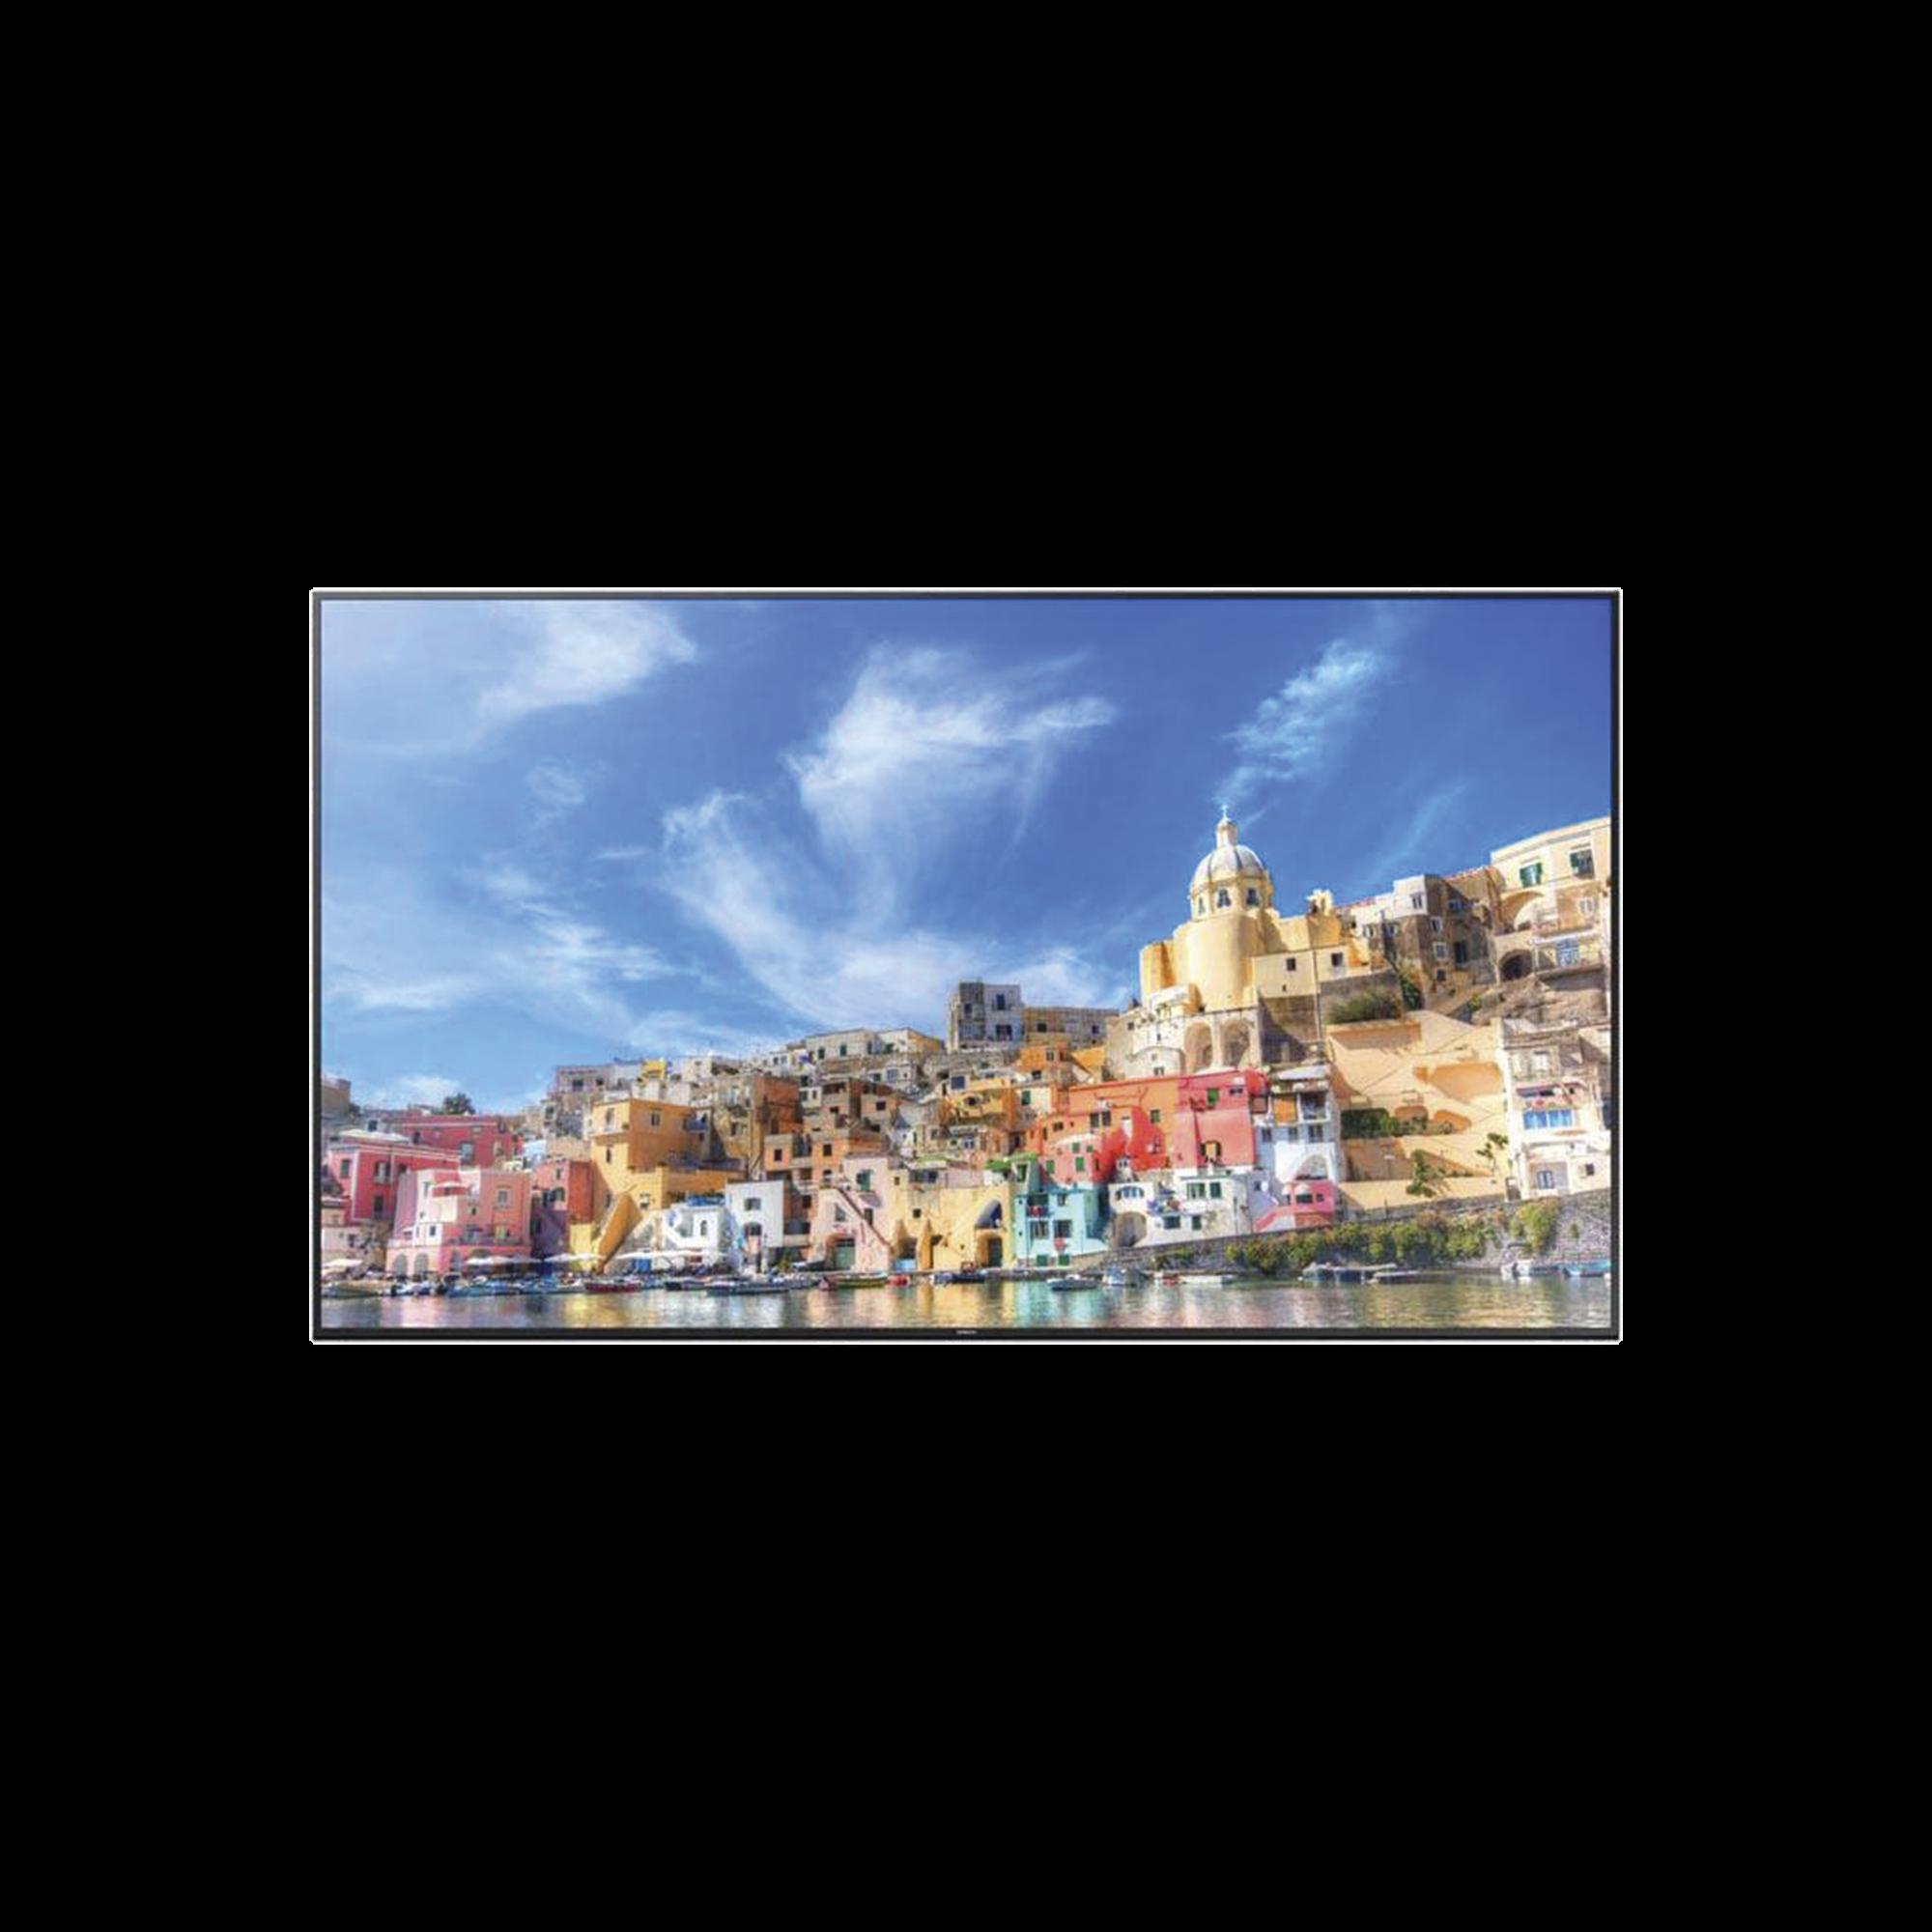 Pantalla Profesional SLIM DIRECT LED BLU de 85, Resolución 4K (UHD), Entradas de Video  DVI / HDMI / DisplayPort / D-SUB / HDCP